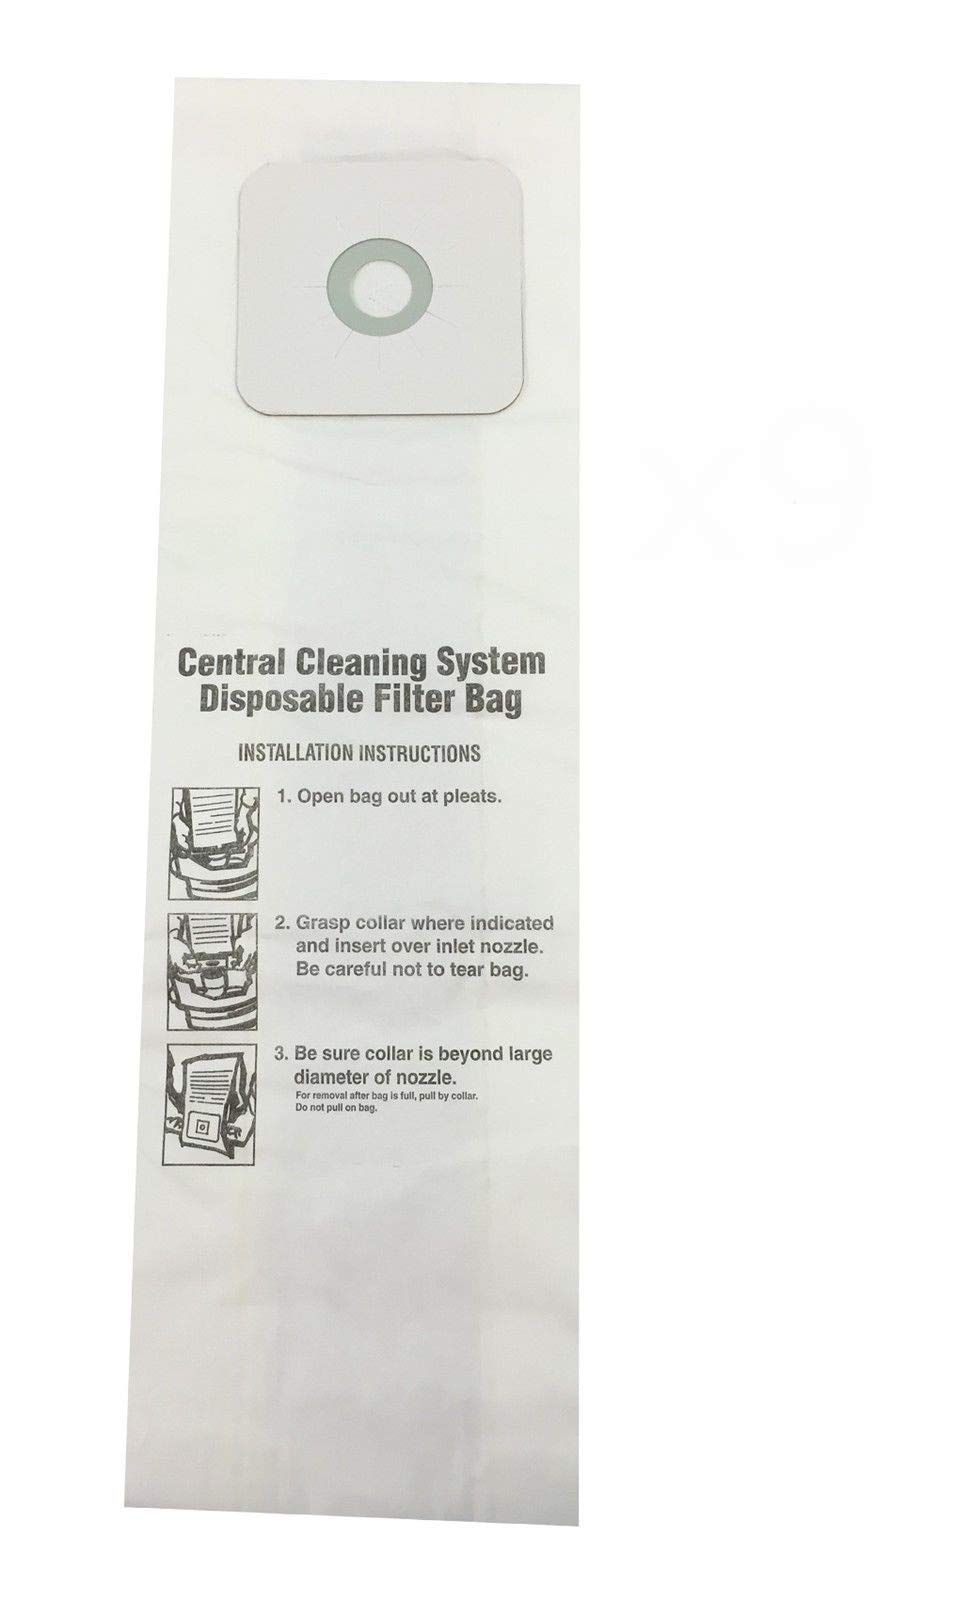 Compatible Central Vac Bags for Nutone 6 Gallon CV350 CV352 CV353 CV450 CV653 (9 Pack)